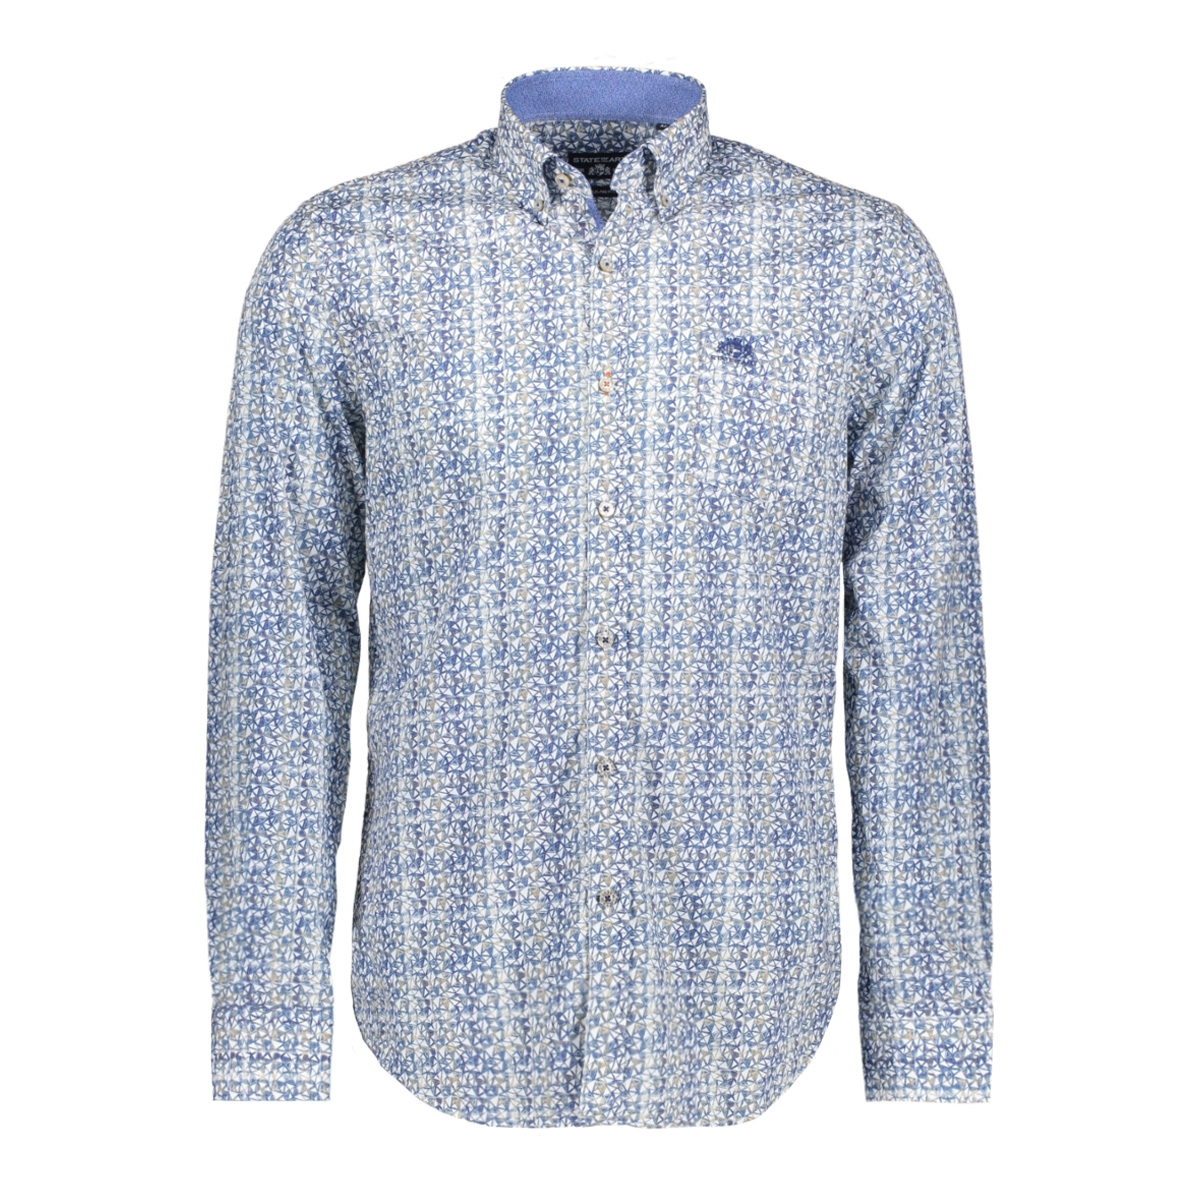 214-17040 state of art overhemd 5357